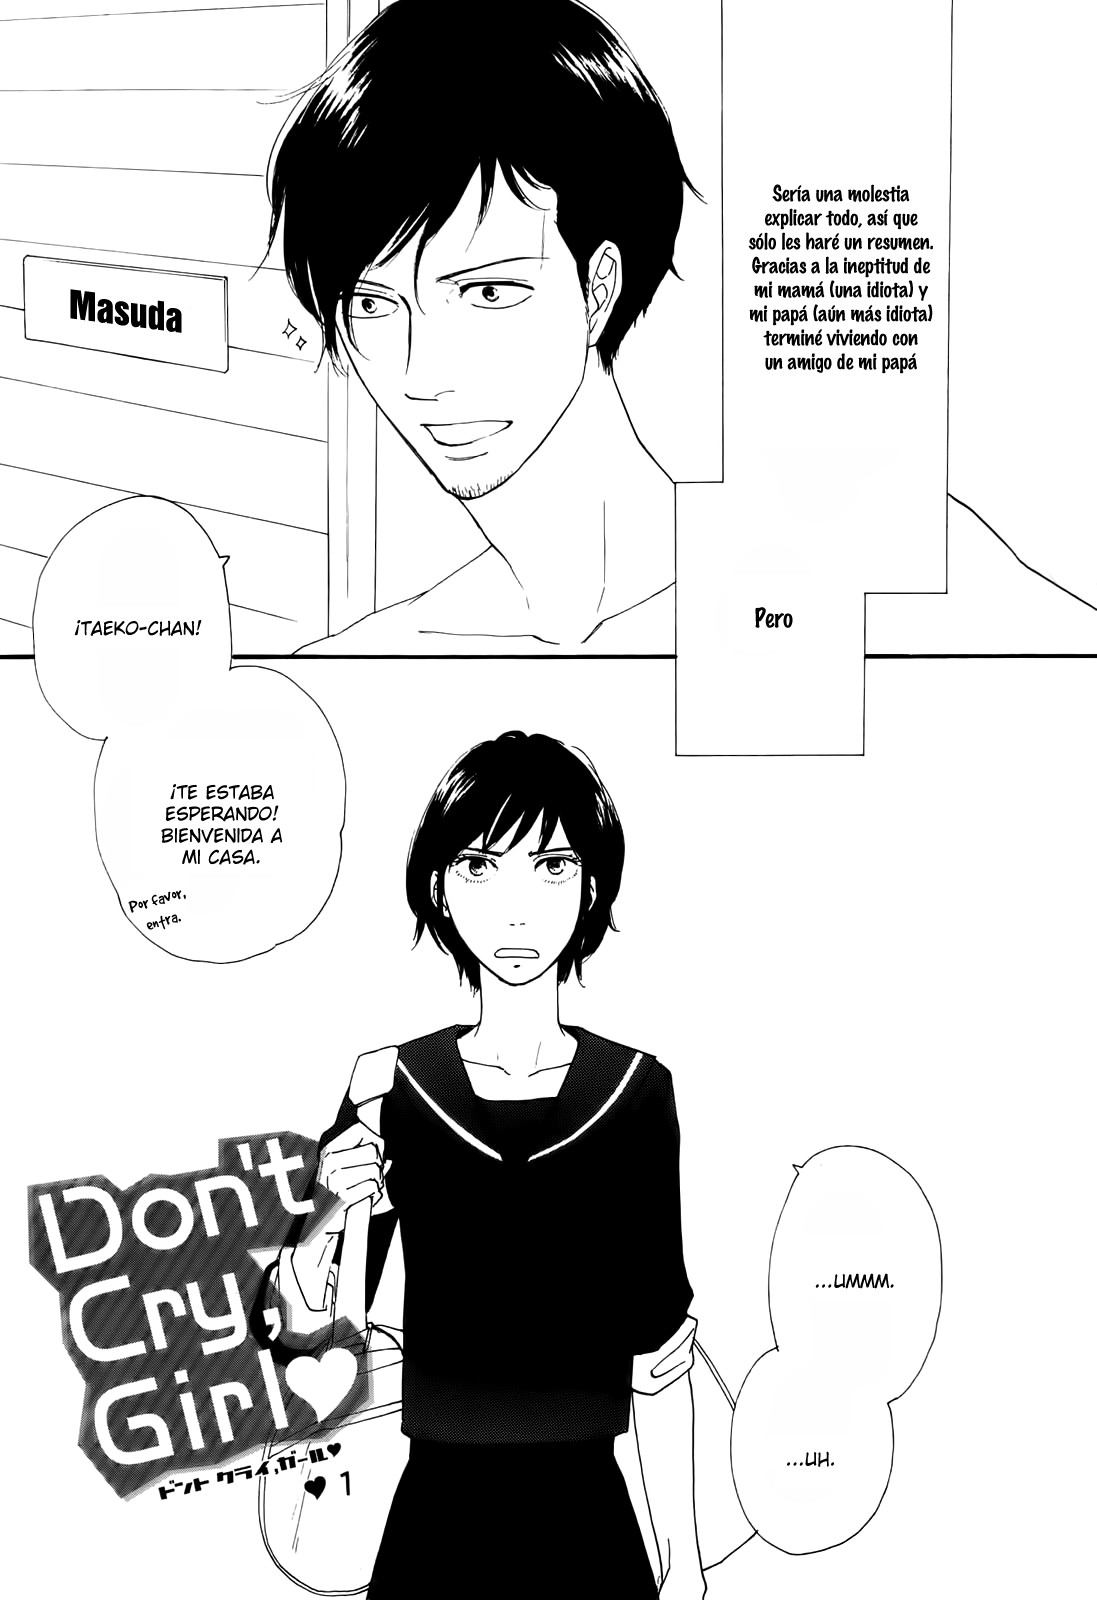 https://nine.mangadogs.com/es_manga/pic9/60/11580/972435/e8c31e84ce8c404ef43b295d3fb396d0.jpg Page 1